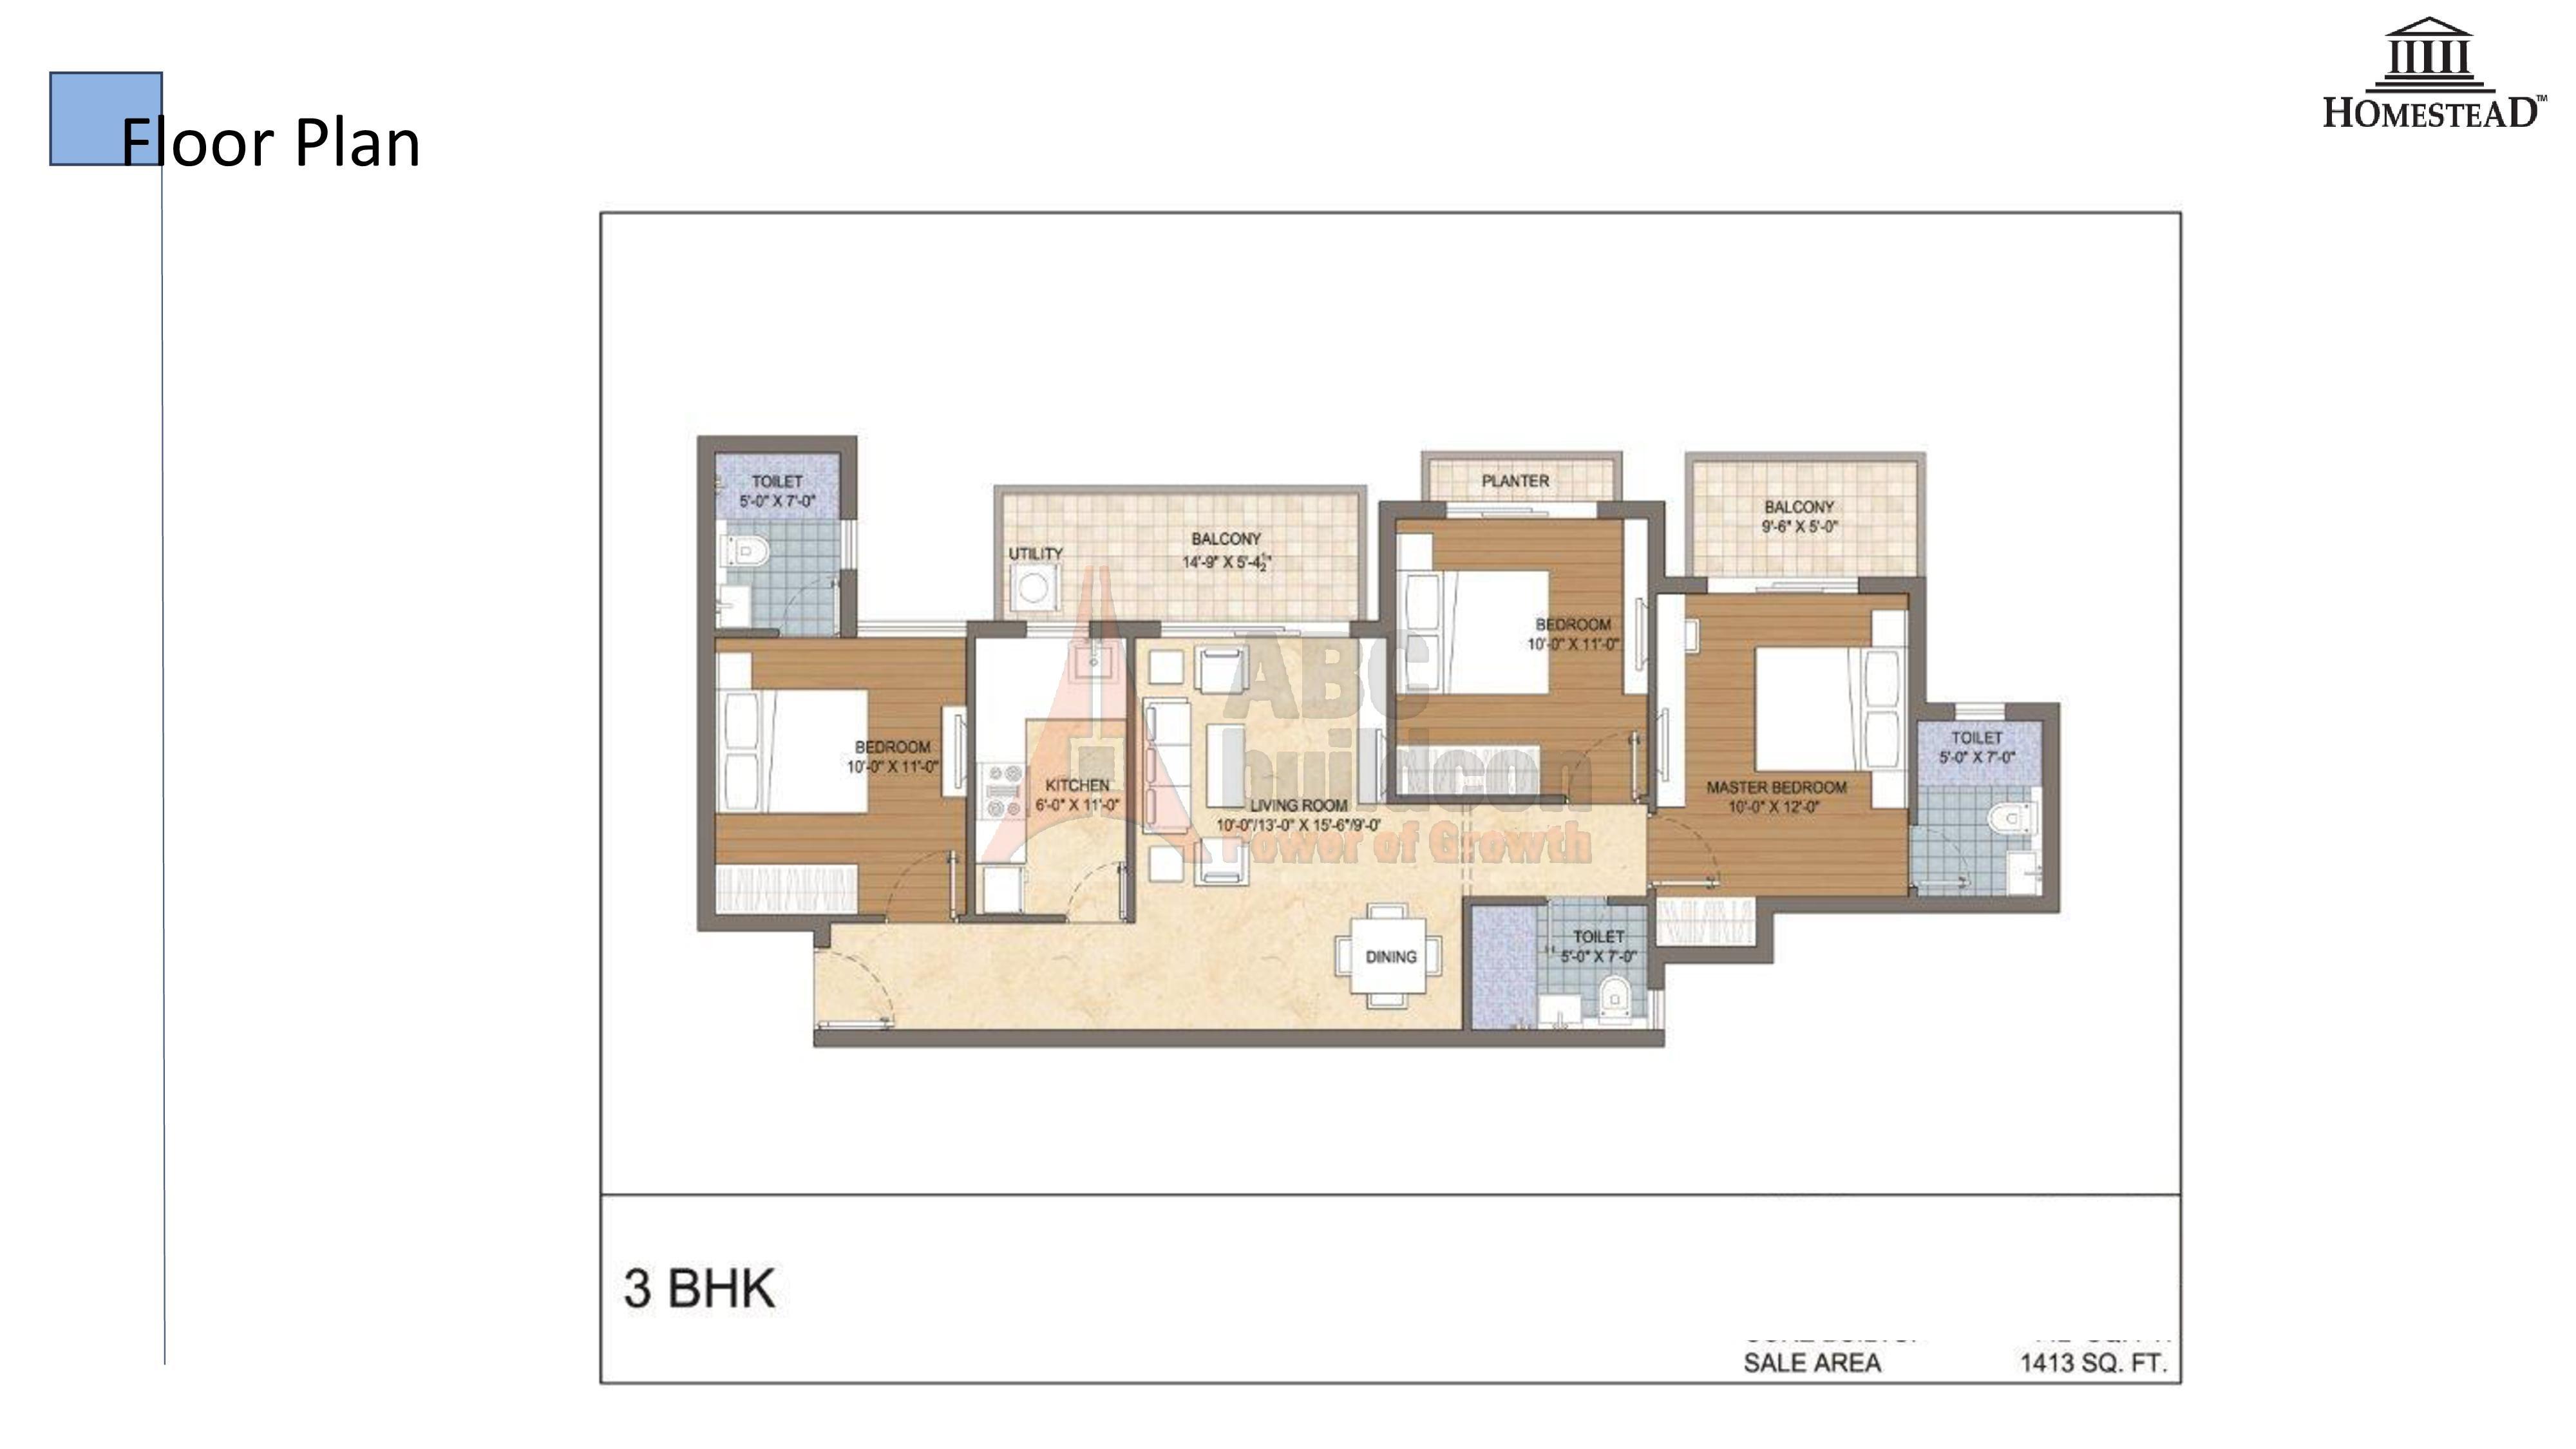 Landcraft Homes Floor Plans: Homestead Cuteburrow Residences Sohna